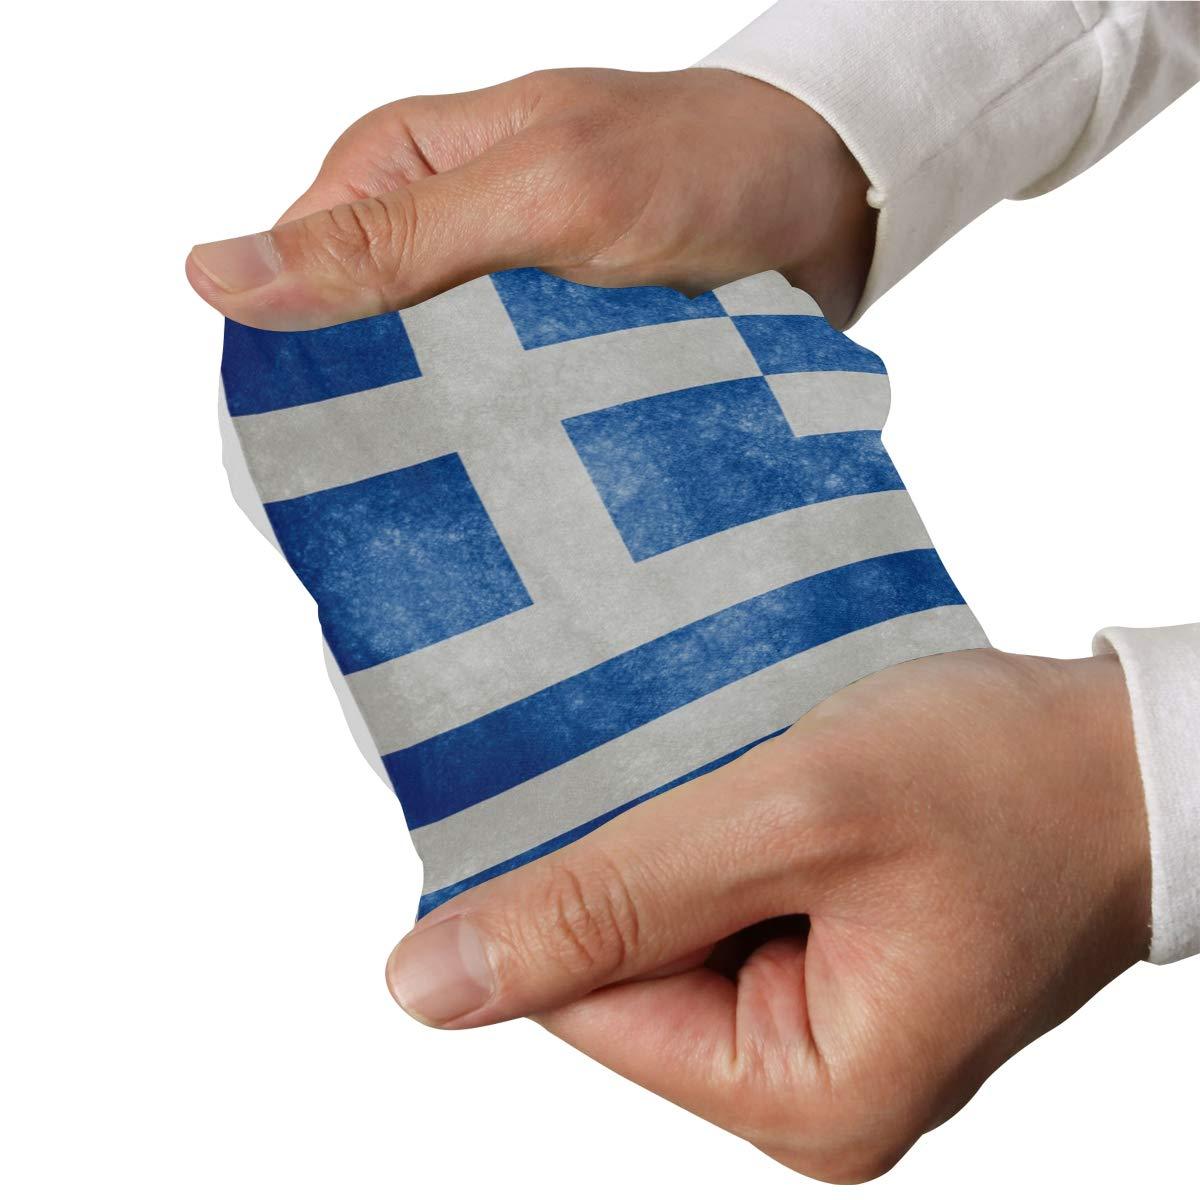 e962c4557a OKBYGD Greece Flag 1 Pair Sports Compression Arm Sleeve Cooling Sun  Protection for Baseball Basketball Football ...